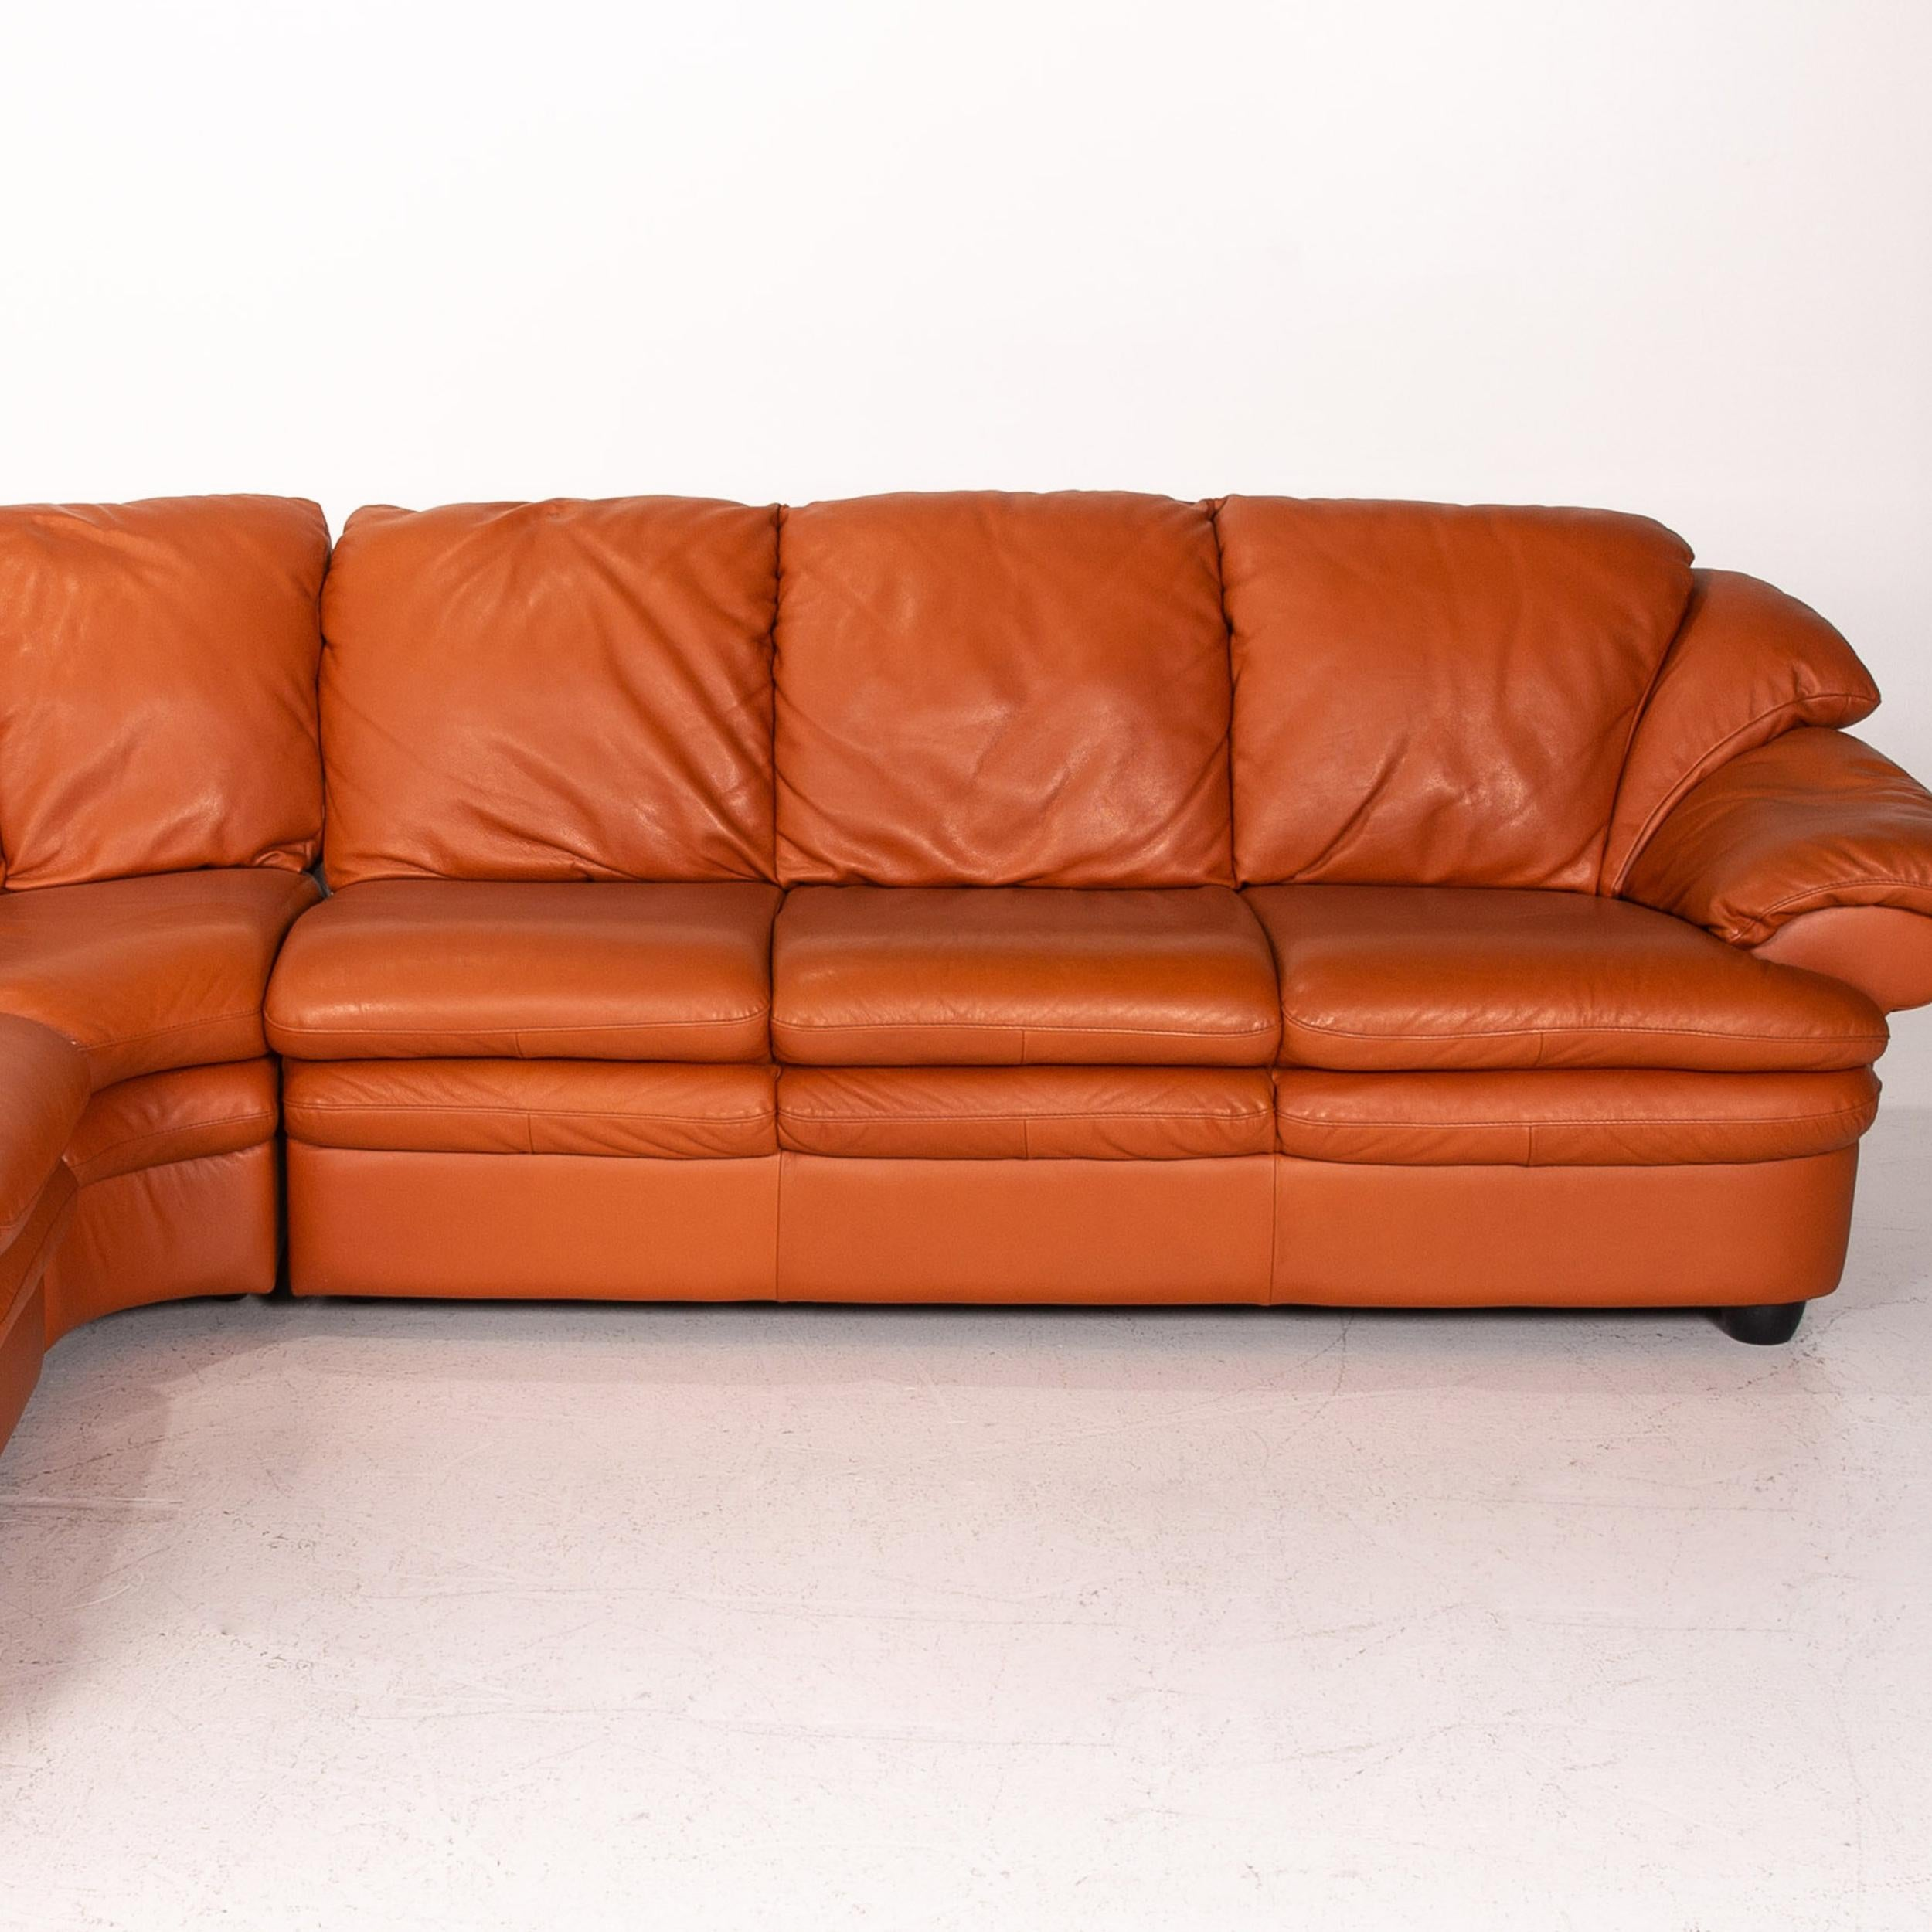 Picture of natuzzi italia algo taupe leather sofa with two electric reclining function. Natuzzi Leather Sofa Set Terracotta 1 Corner Sofa 1 Stool ...